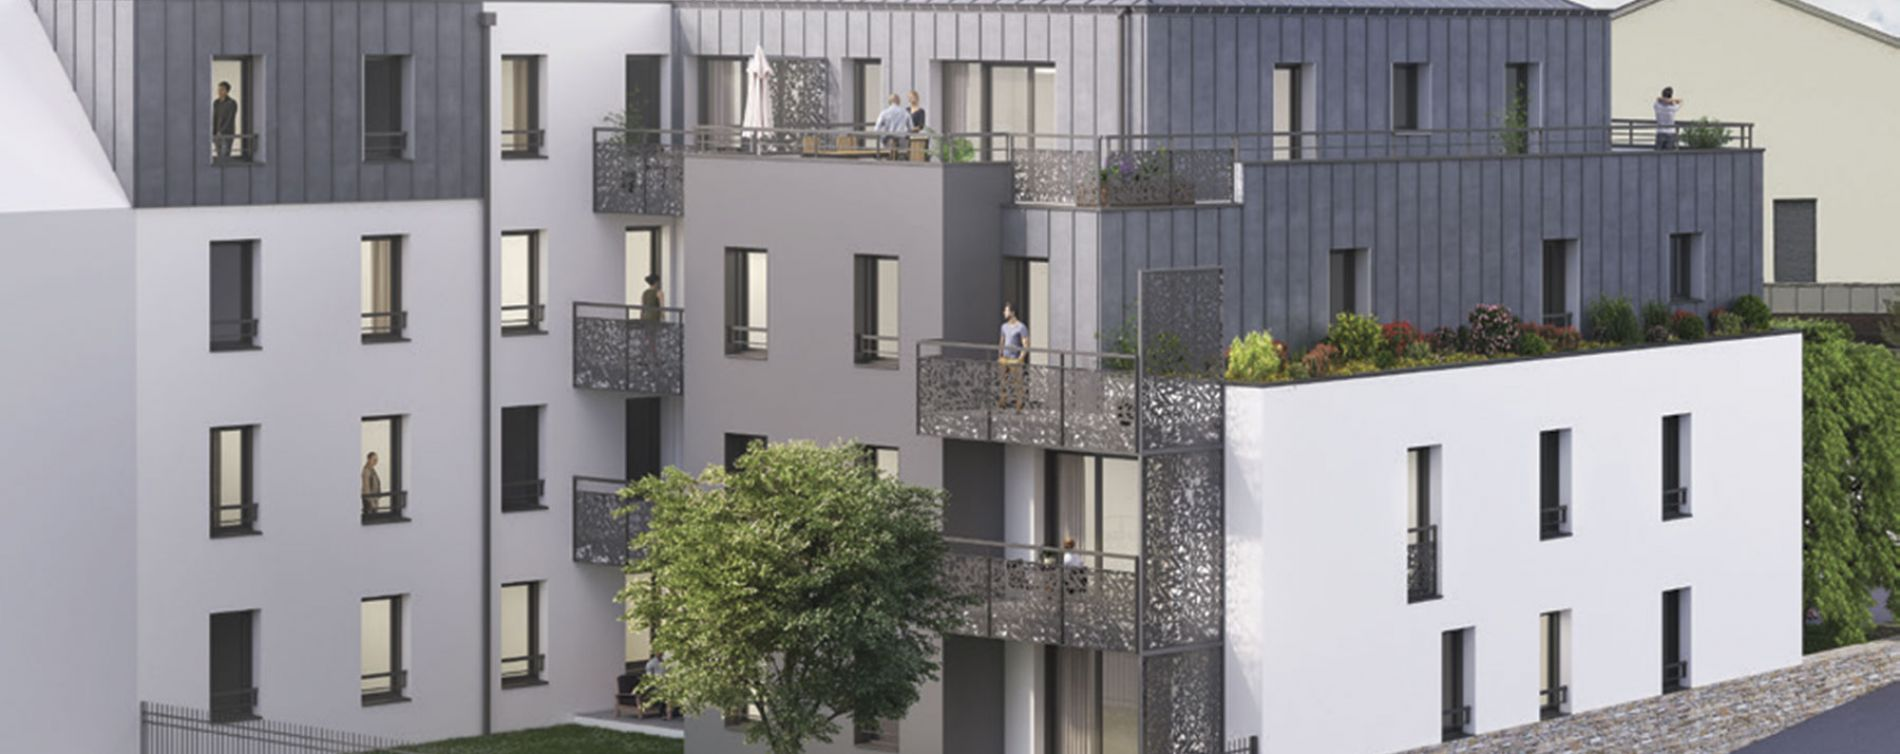 Résidence Villa Anna à Saint-Herblain